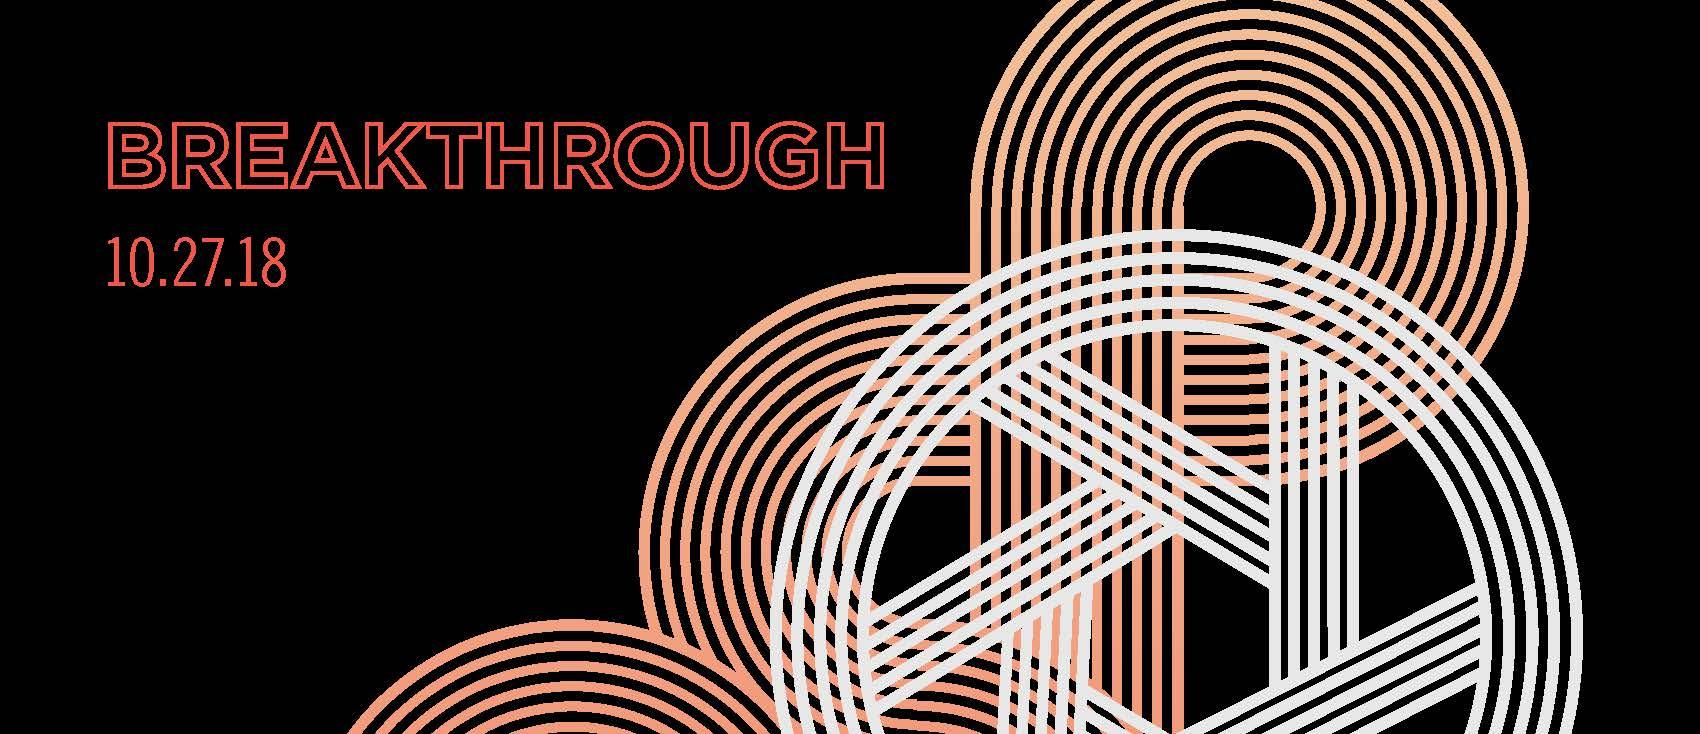 Breakthrough2018_Banners 1.jpg